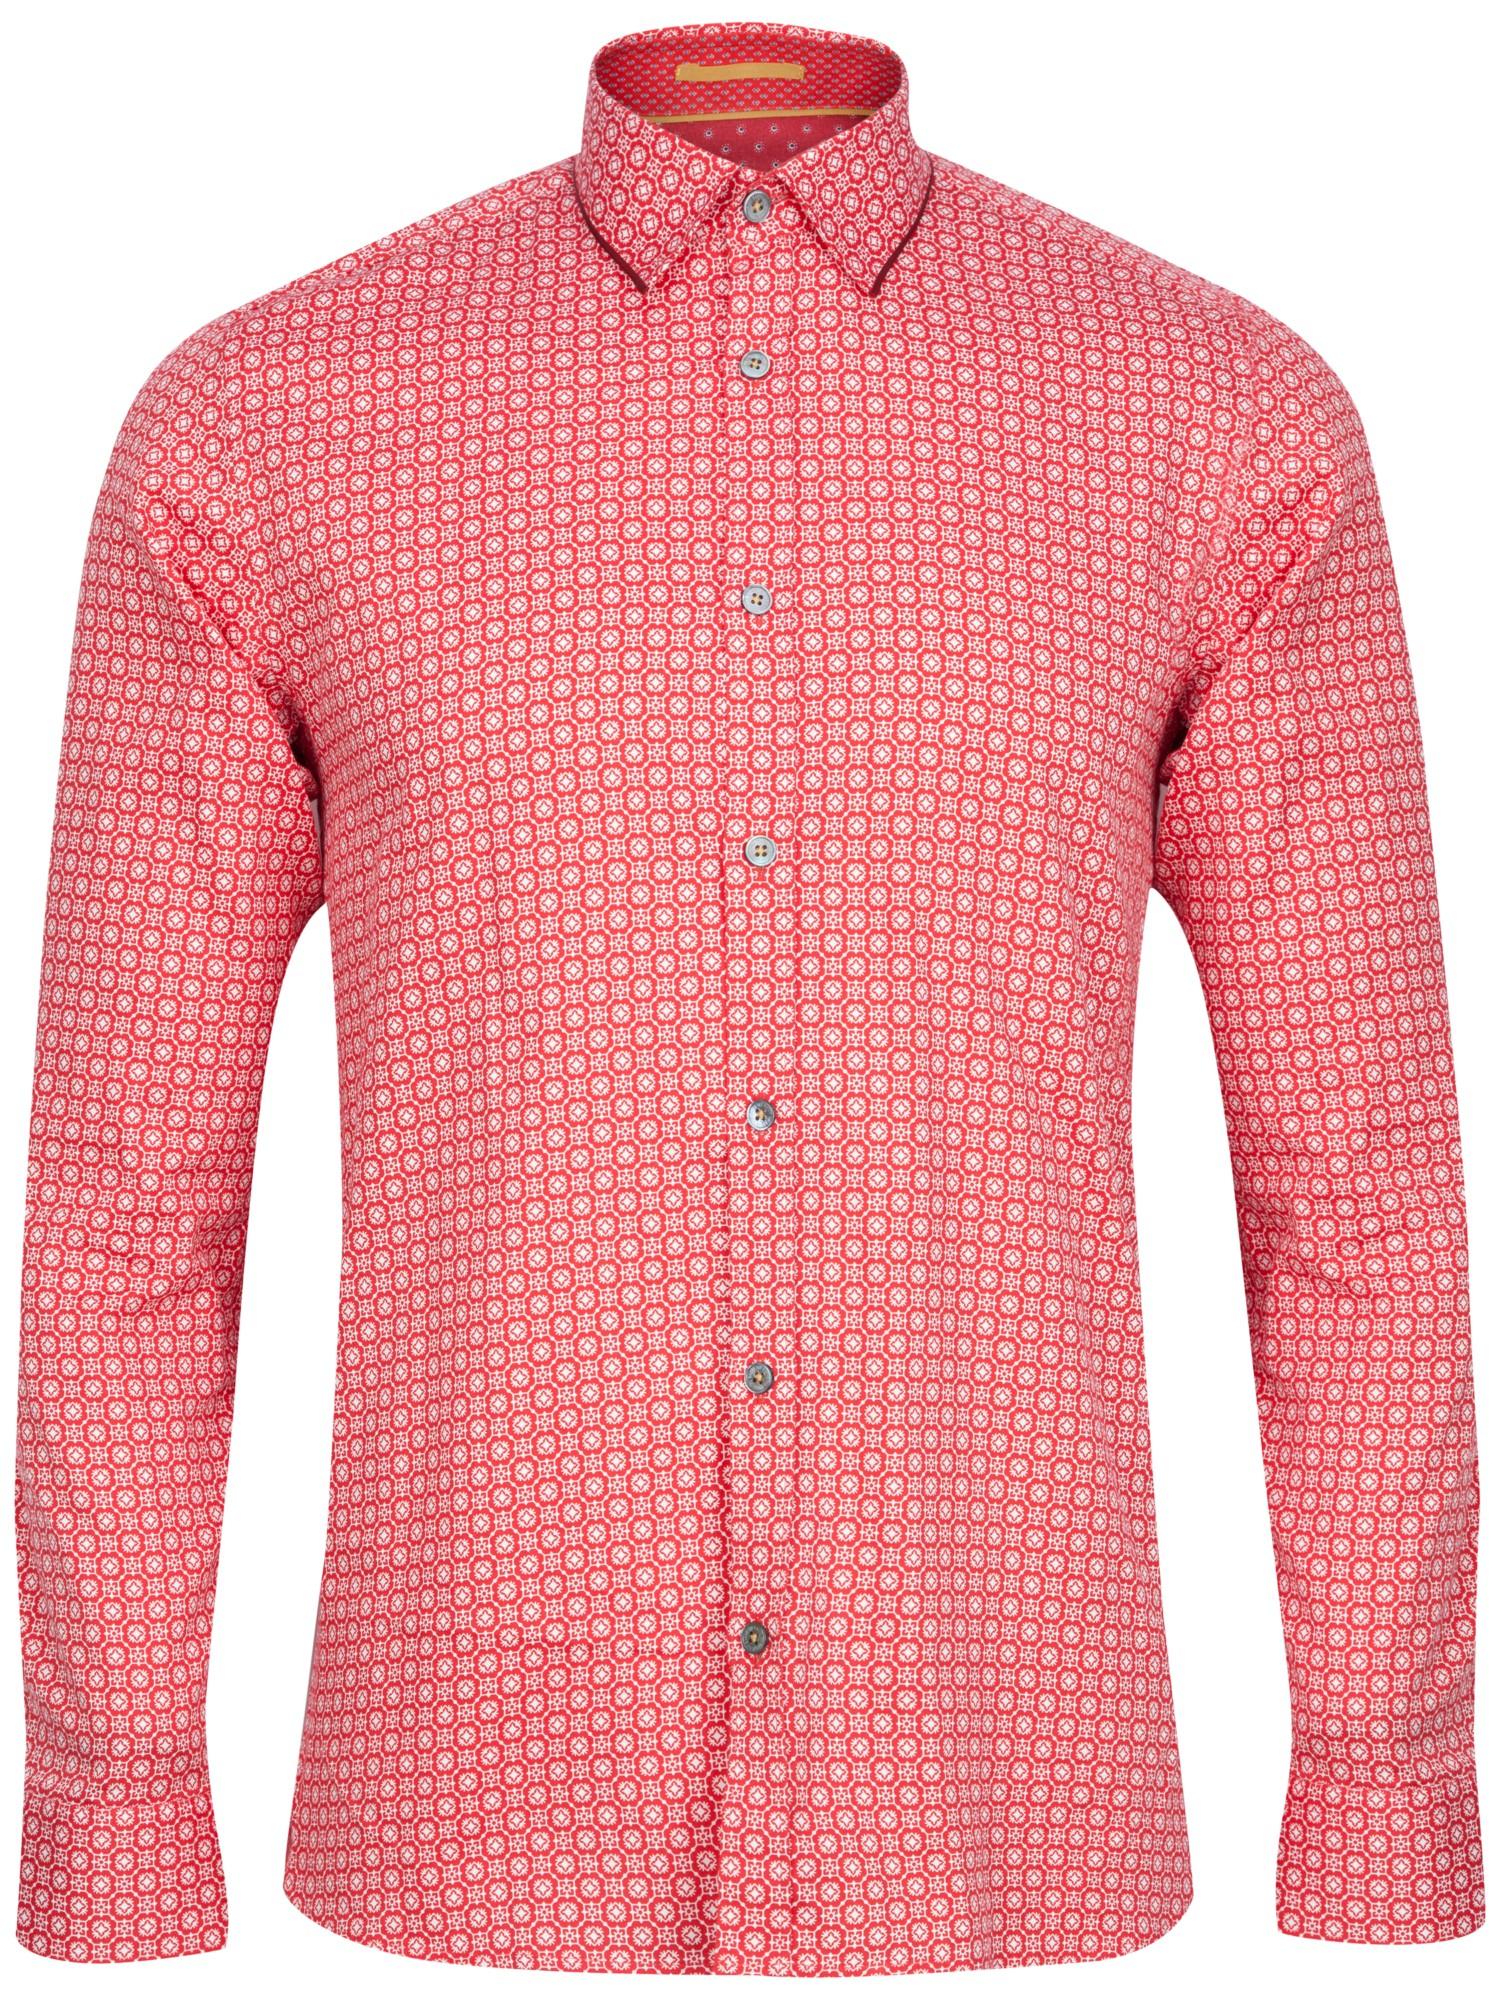 da7cee8f72231e Ted Baker Rumple Print Long Sleeve Shirt in Red for Men - Lyst